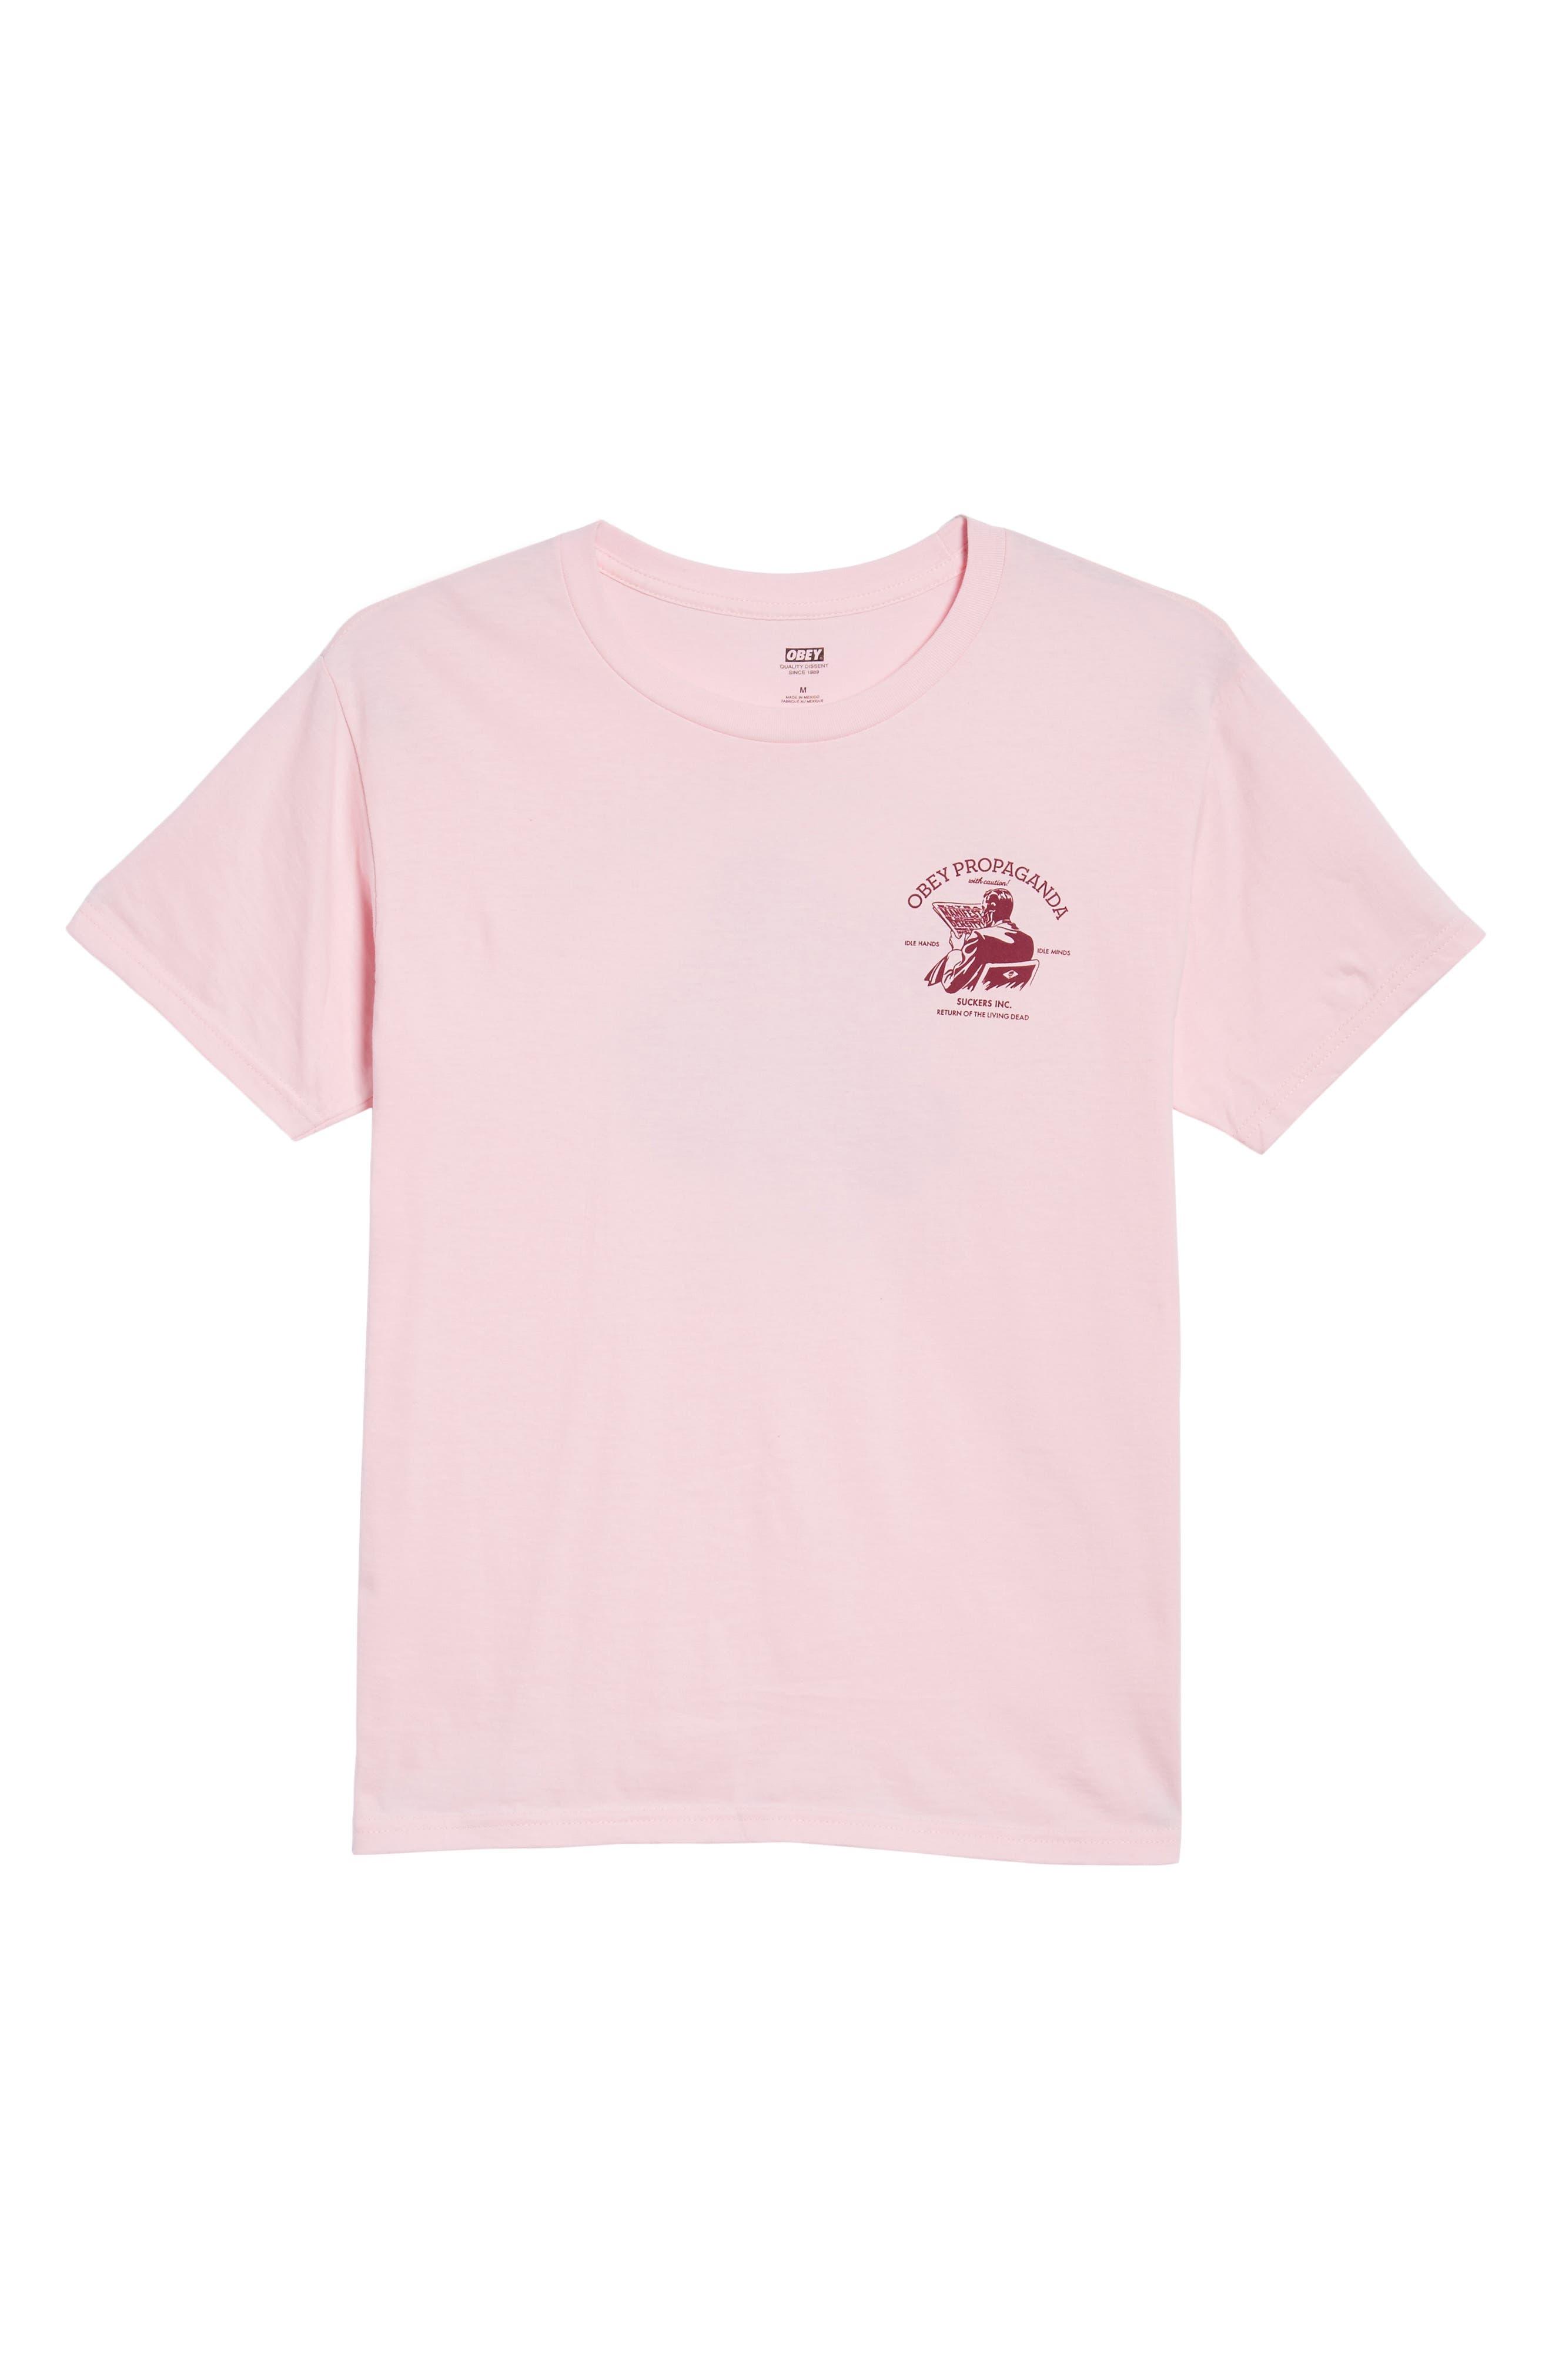 Return of the Dead Premium Graphic T-Shirt,                             Alternate thumbnail 6, color,                             650